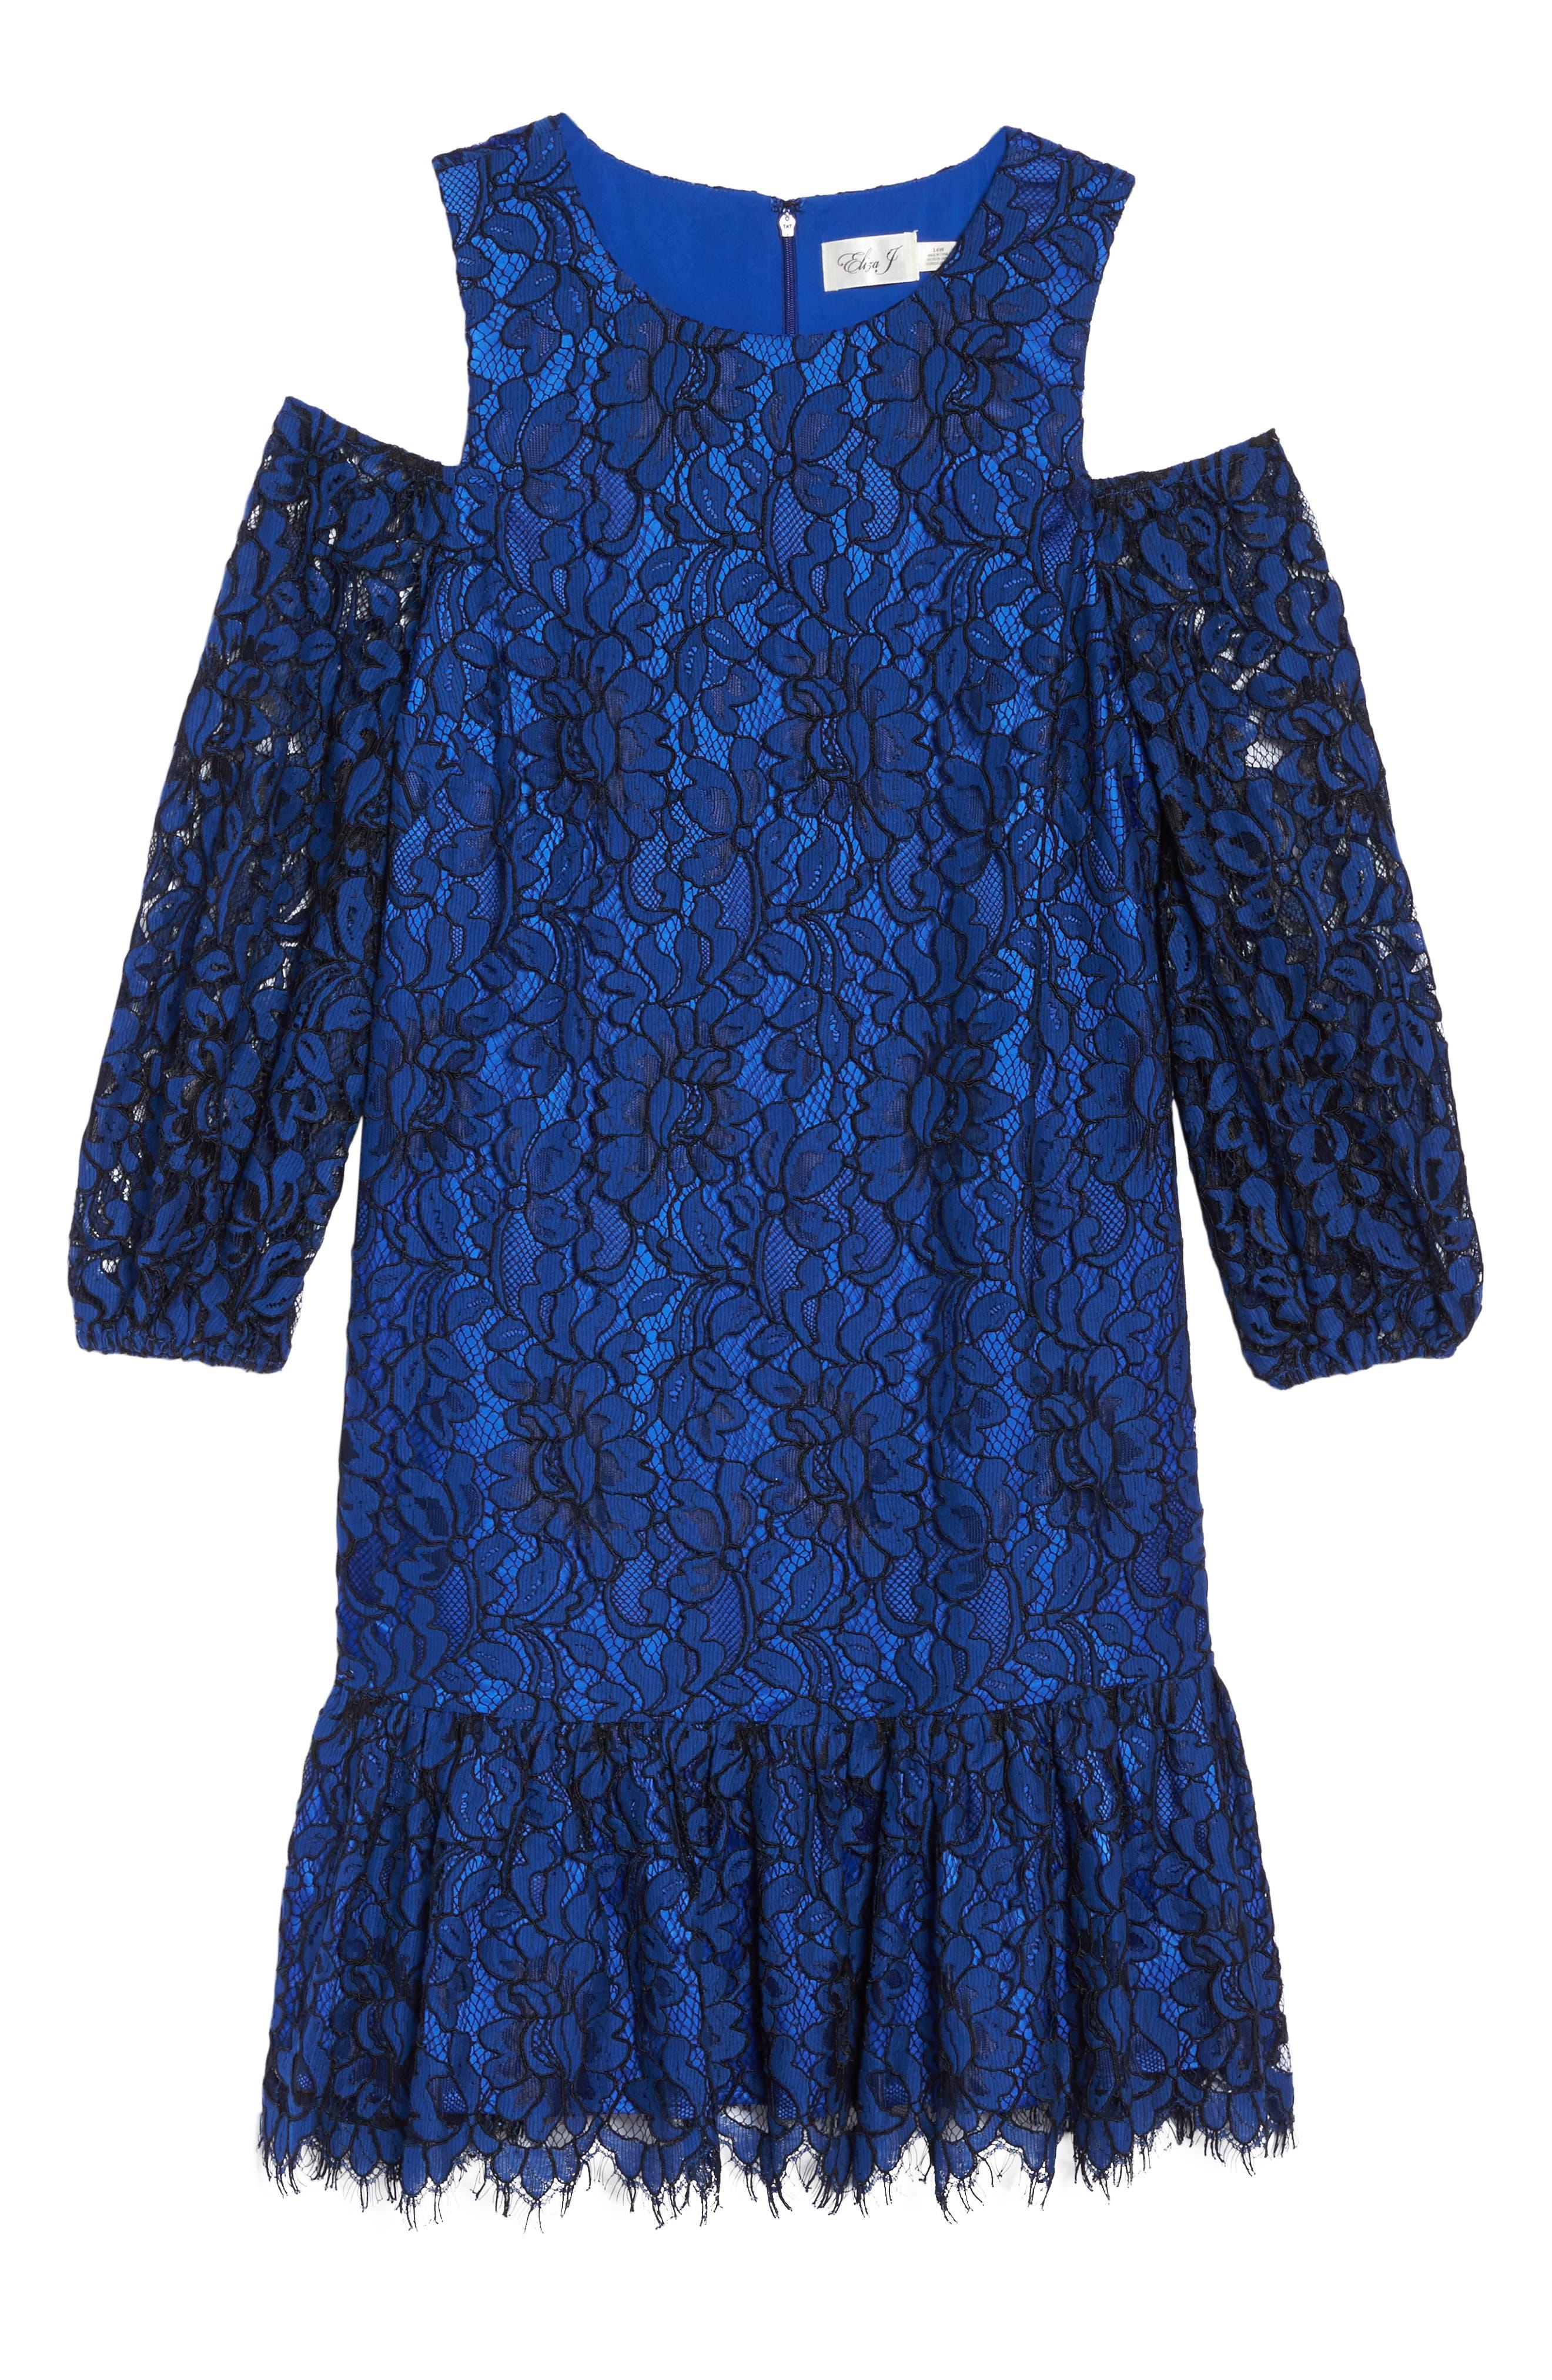 Lace Cold Shoulder Dress,                             Alternate thumbnail 6, color,                             Cobalt/ Black